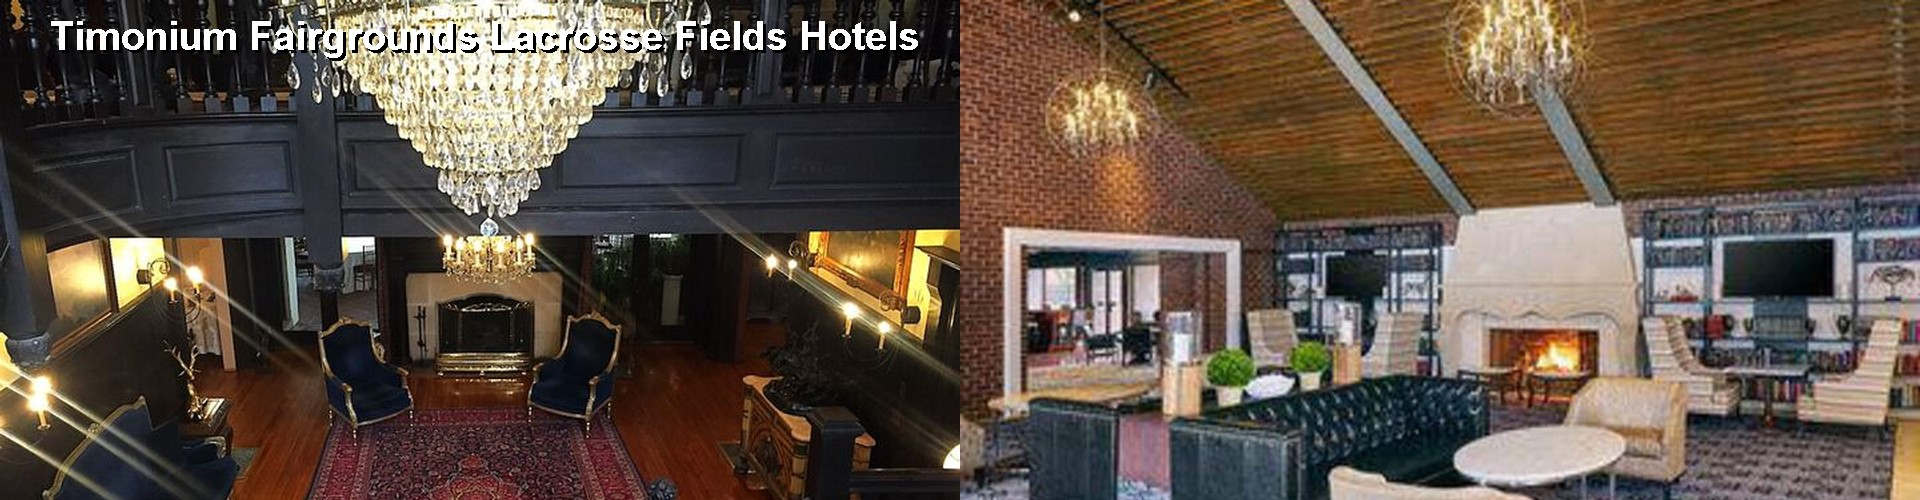 5 Best Hotels Near Timonium Fairgrounds Lacrosse Fields